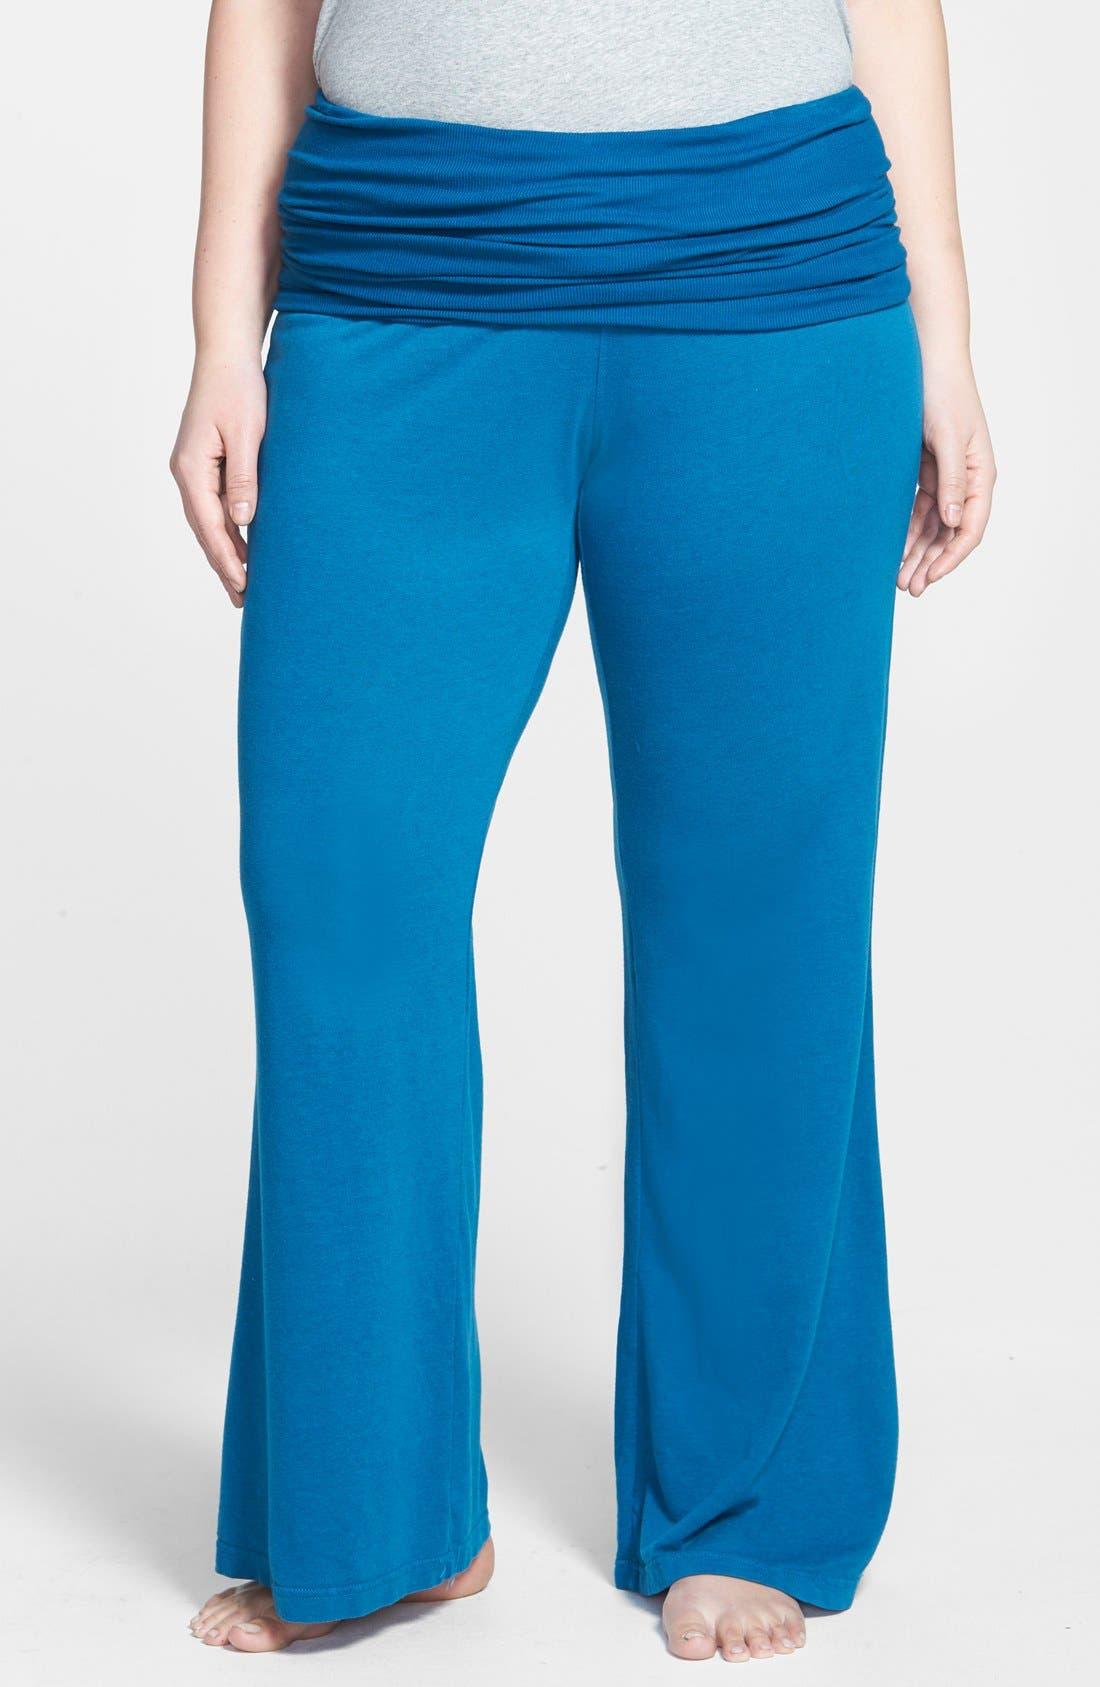 Alternate Image 1 Selected - Hard Tail Wide Leg Pants (Plus Size)